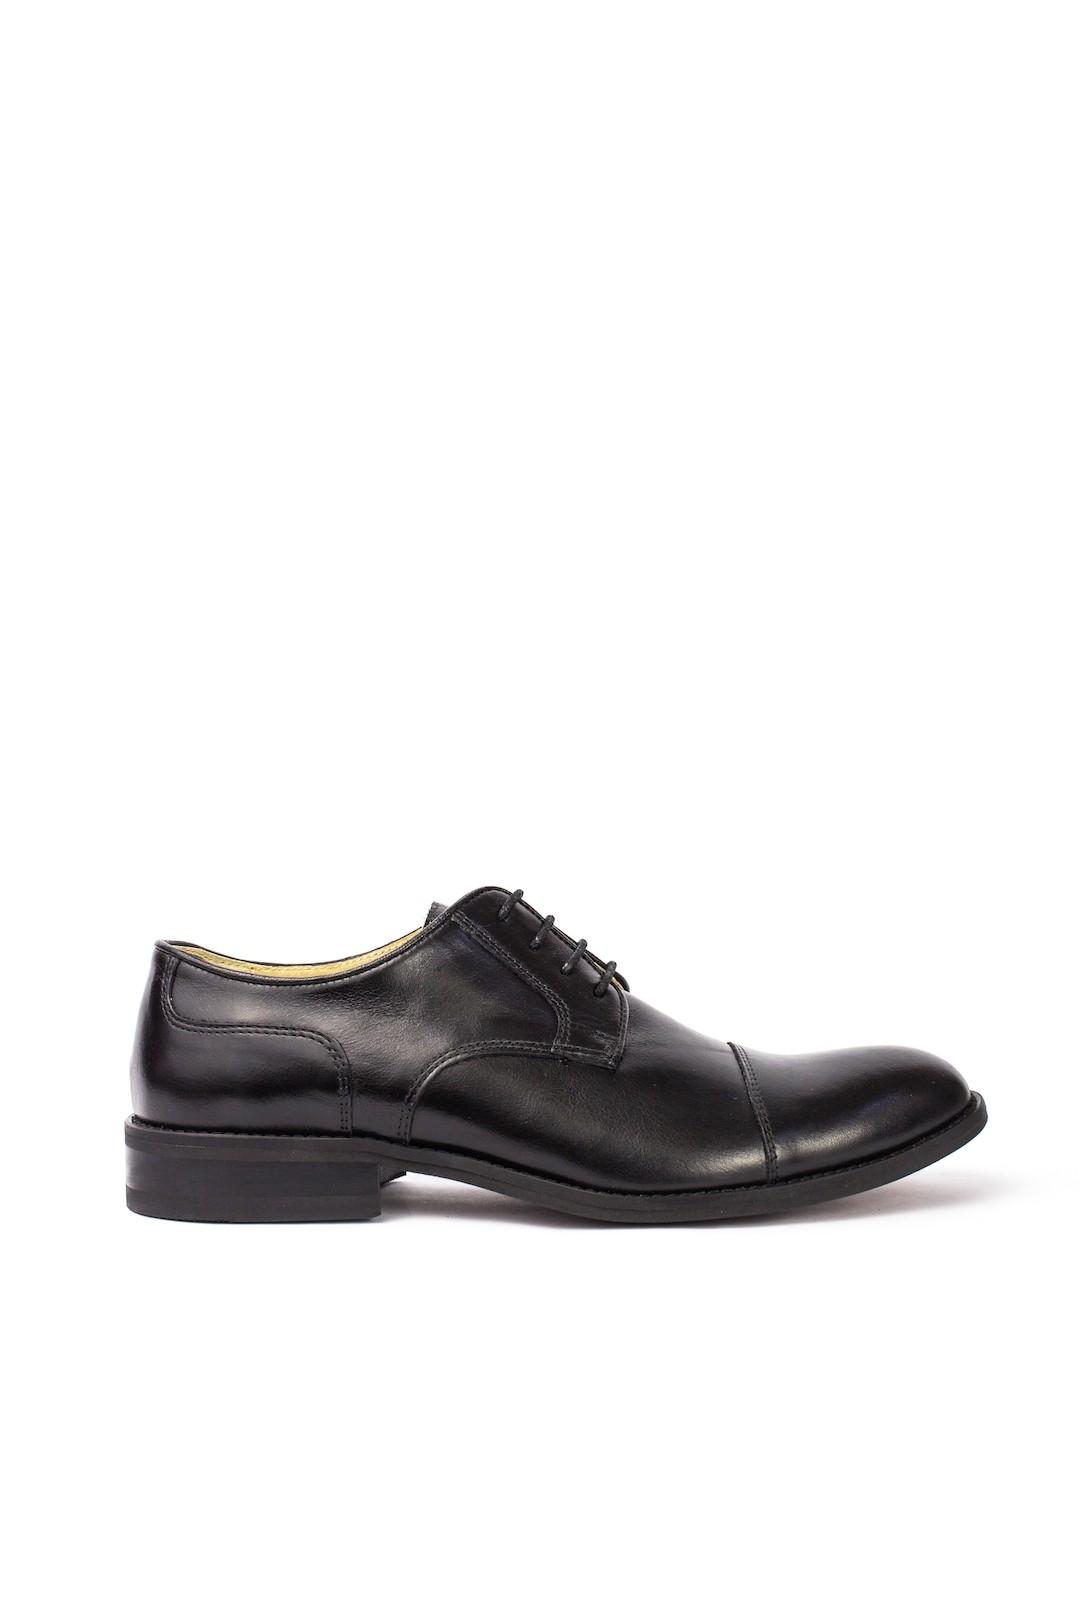 Pantofi Barbati piele naturala negru Adam